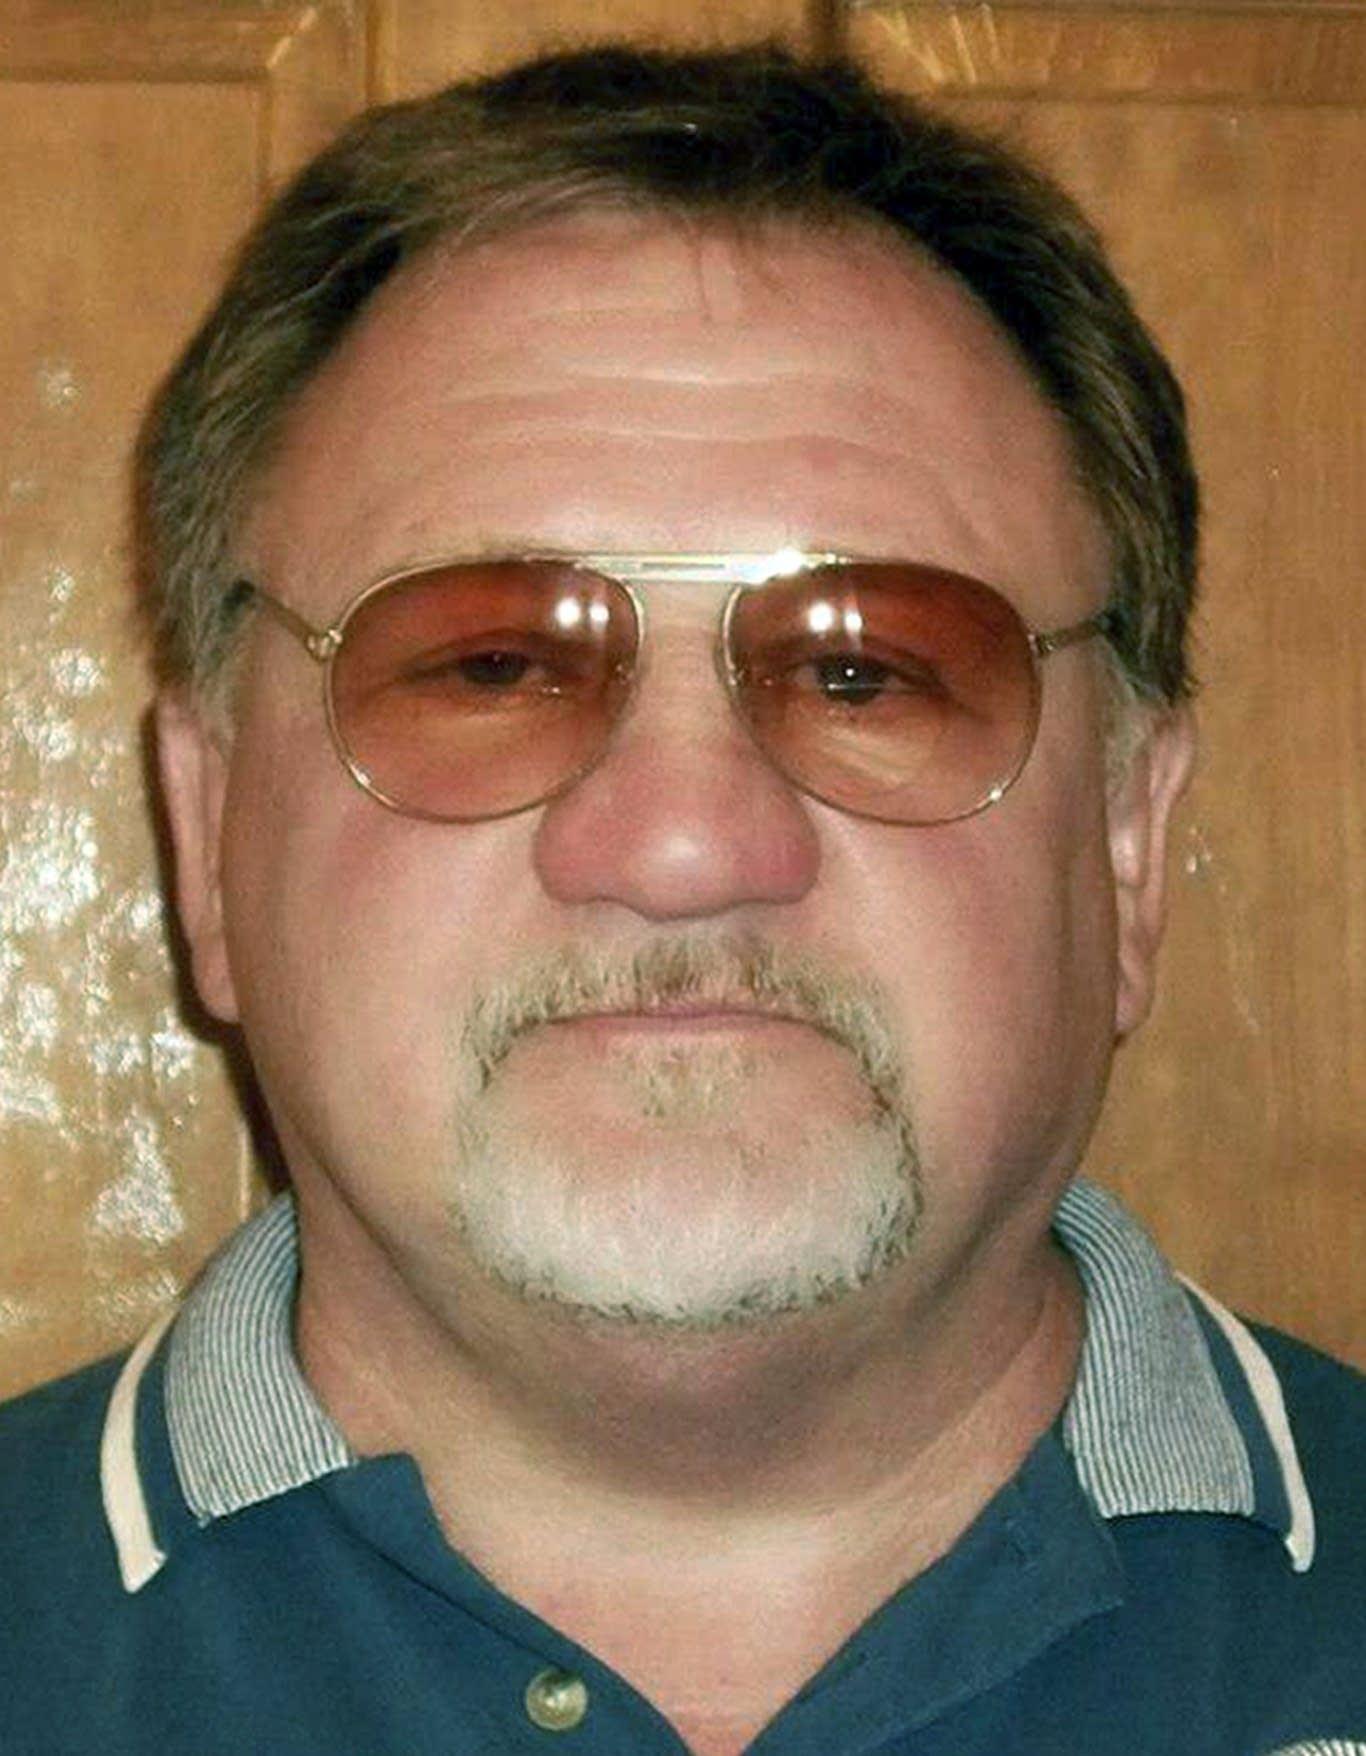 Facebook photo of James T. Hodgkinson